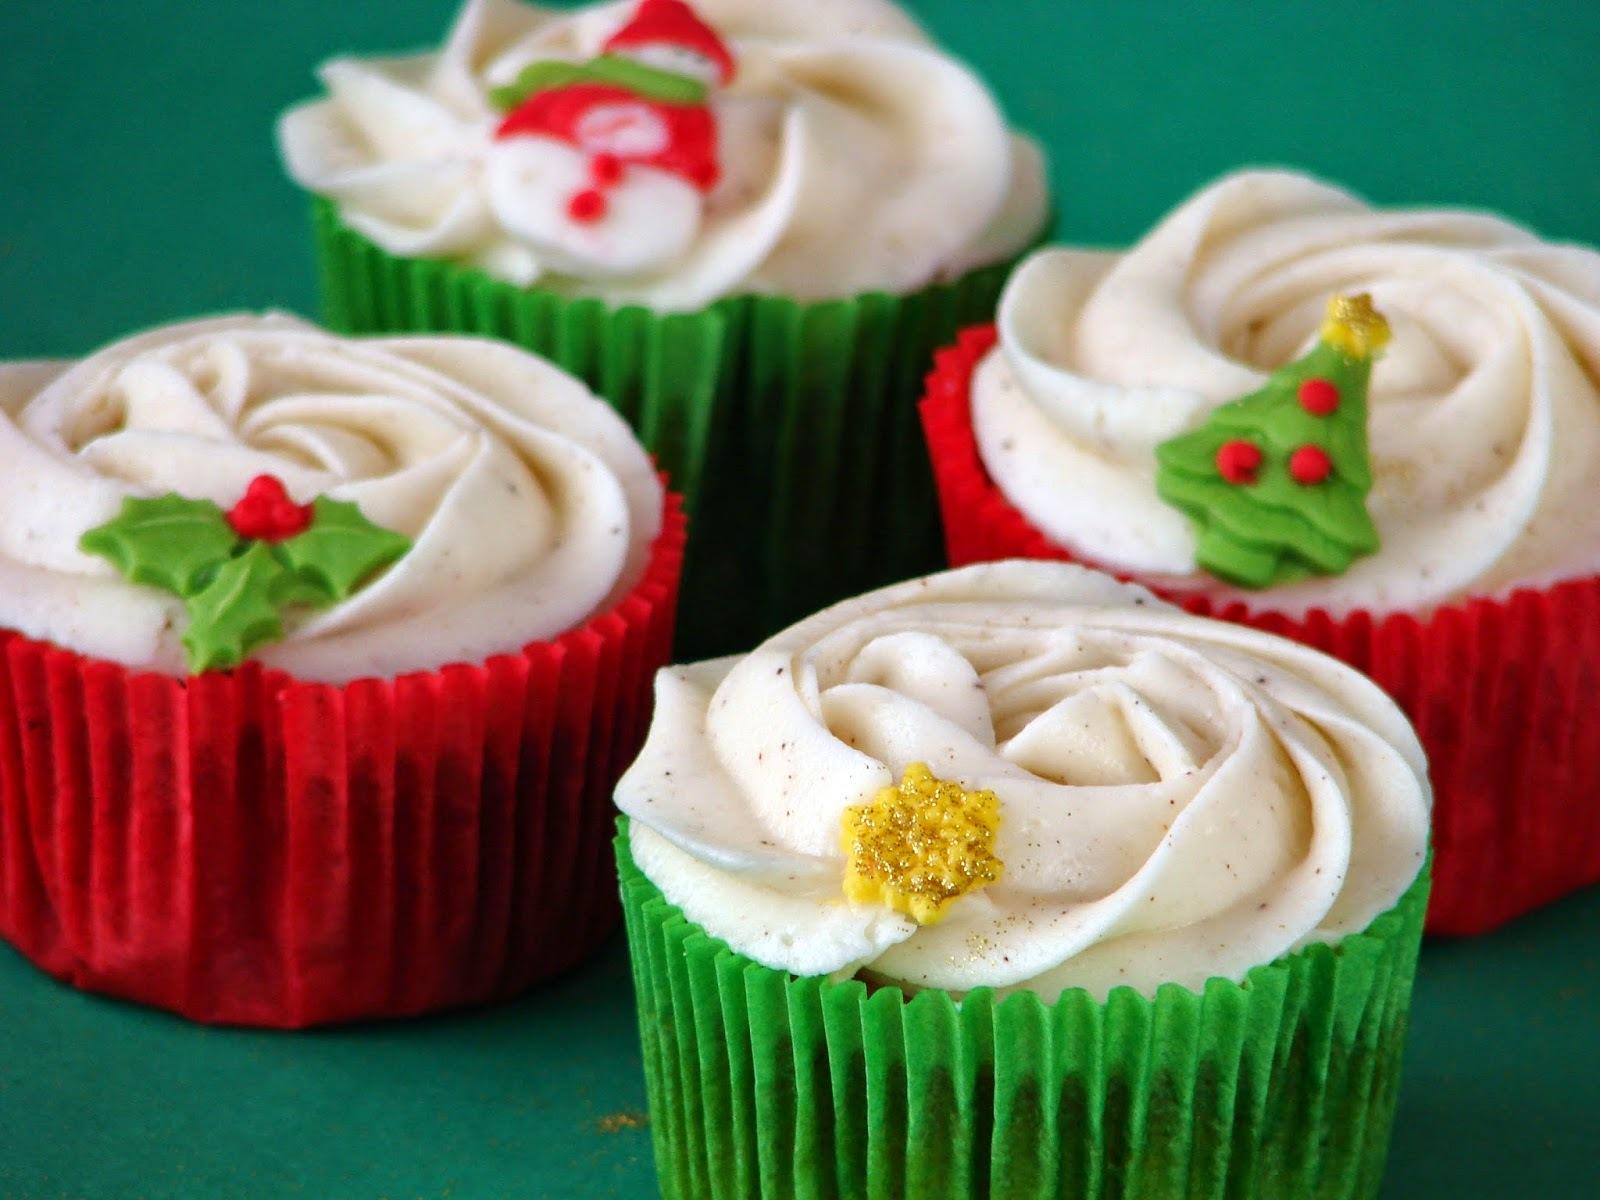 Cupcakes de granberries